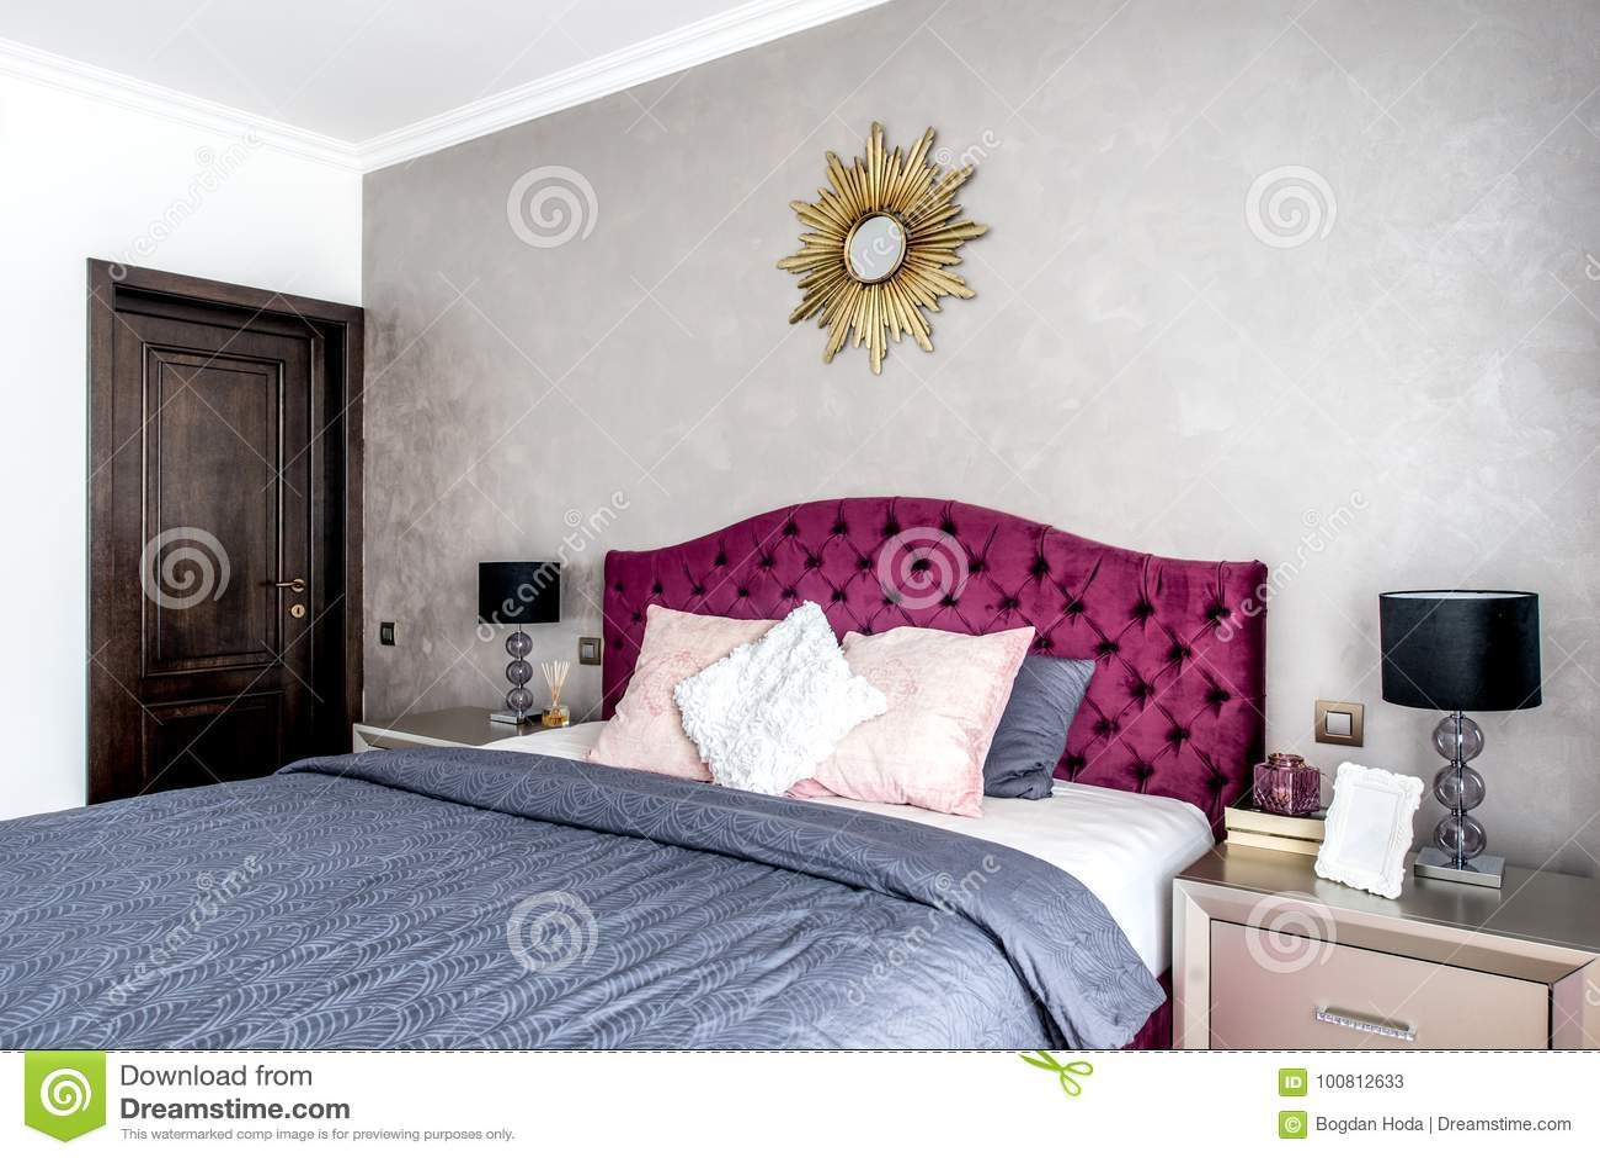 Modern And Cozy Interior Bedroom Design. Master Bedroom